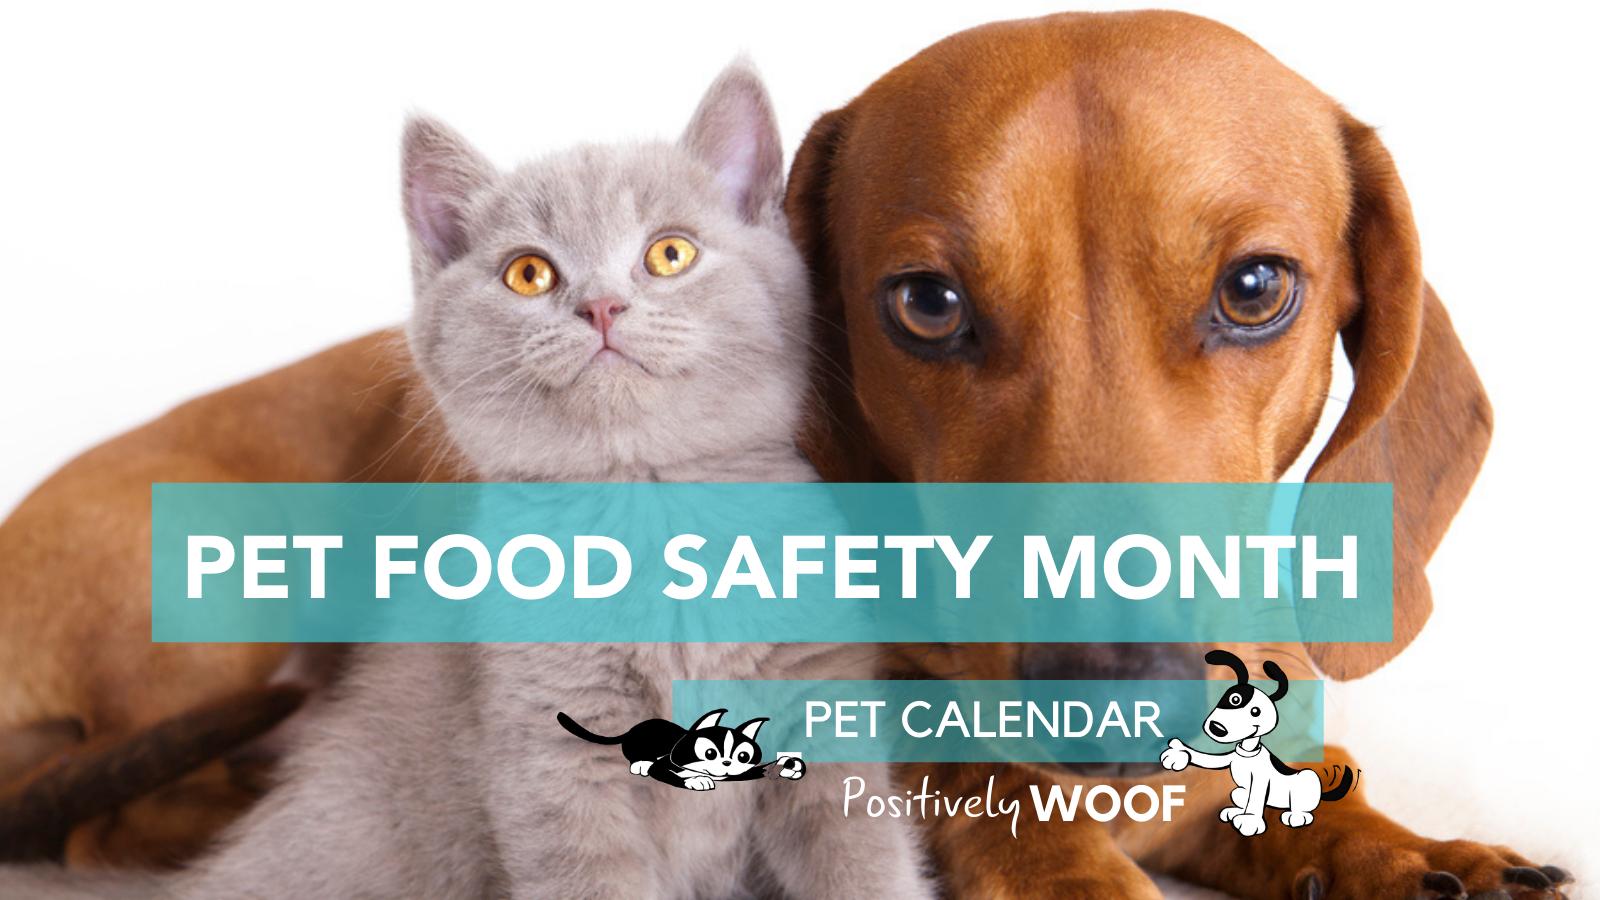 Pet Calendar: Pet Food Safety Month